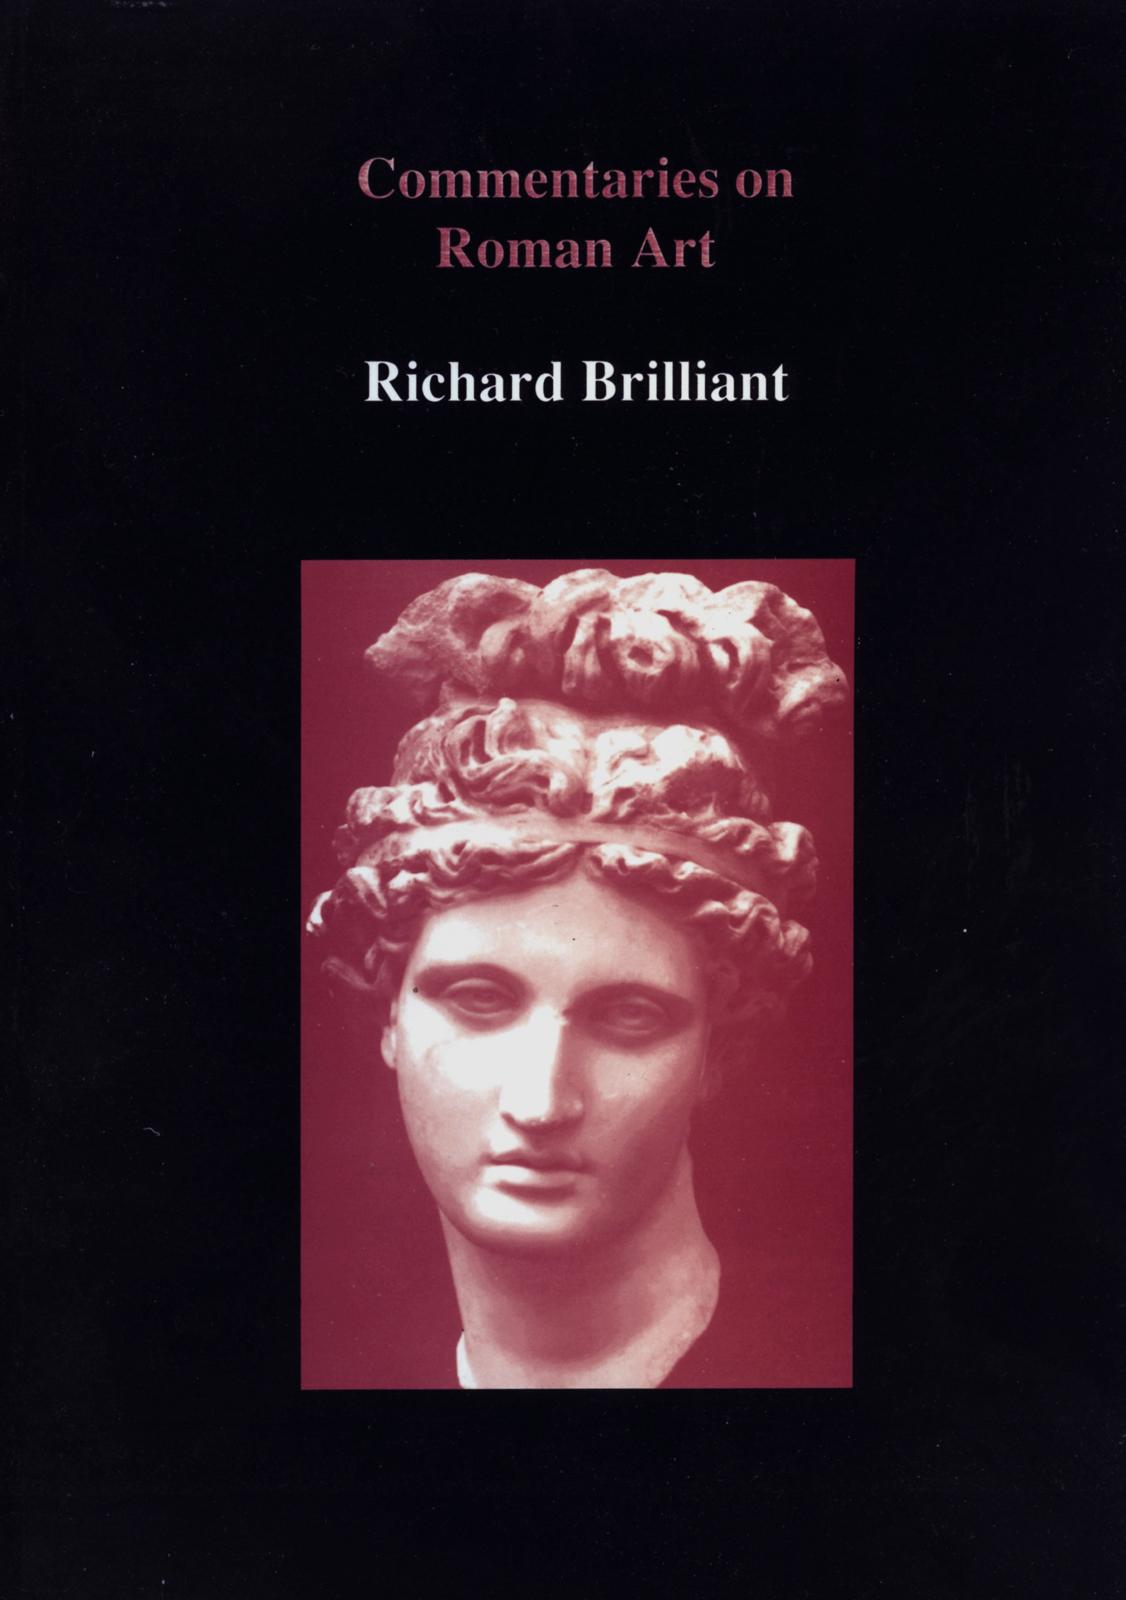 Richard Brilliant